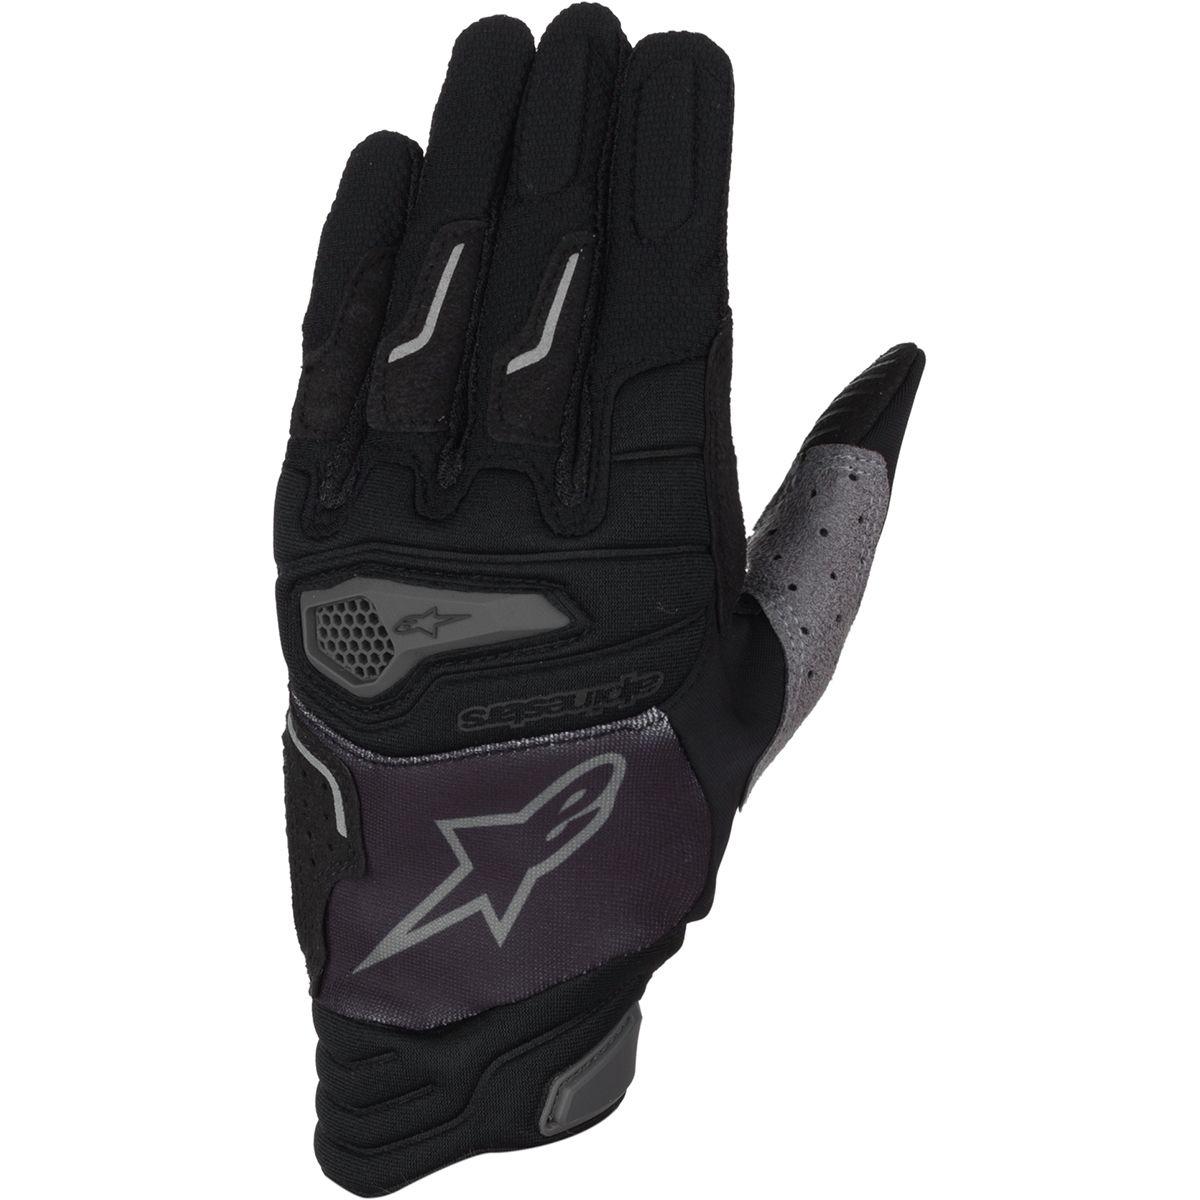 Alpinestars-Drop-Pro-Glove-Men-039-s miniature 23